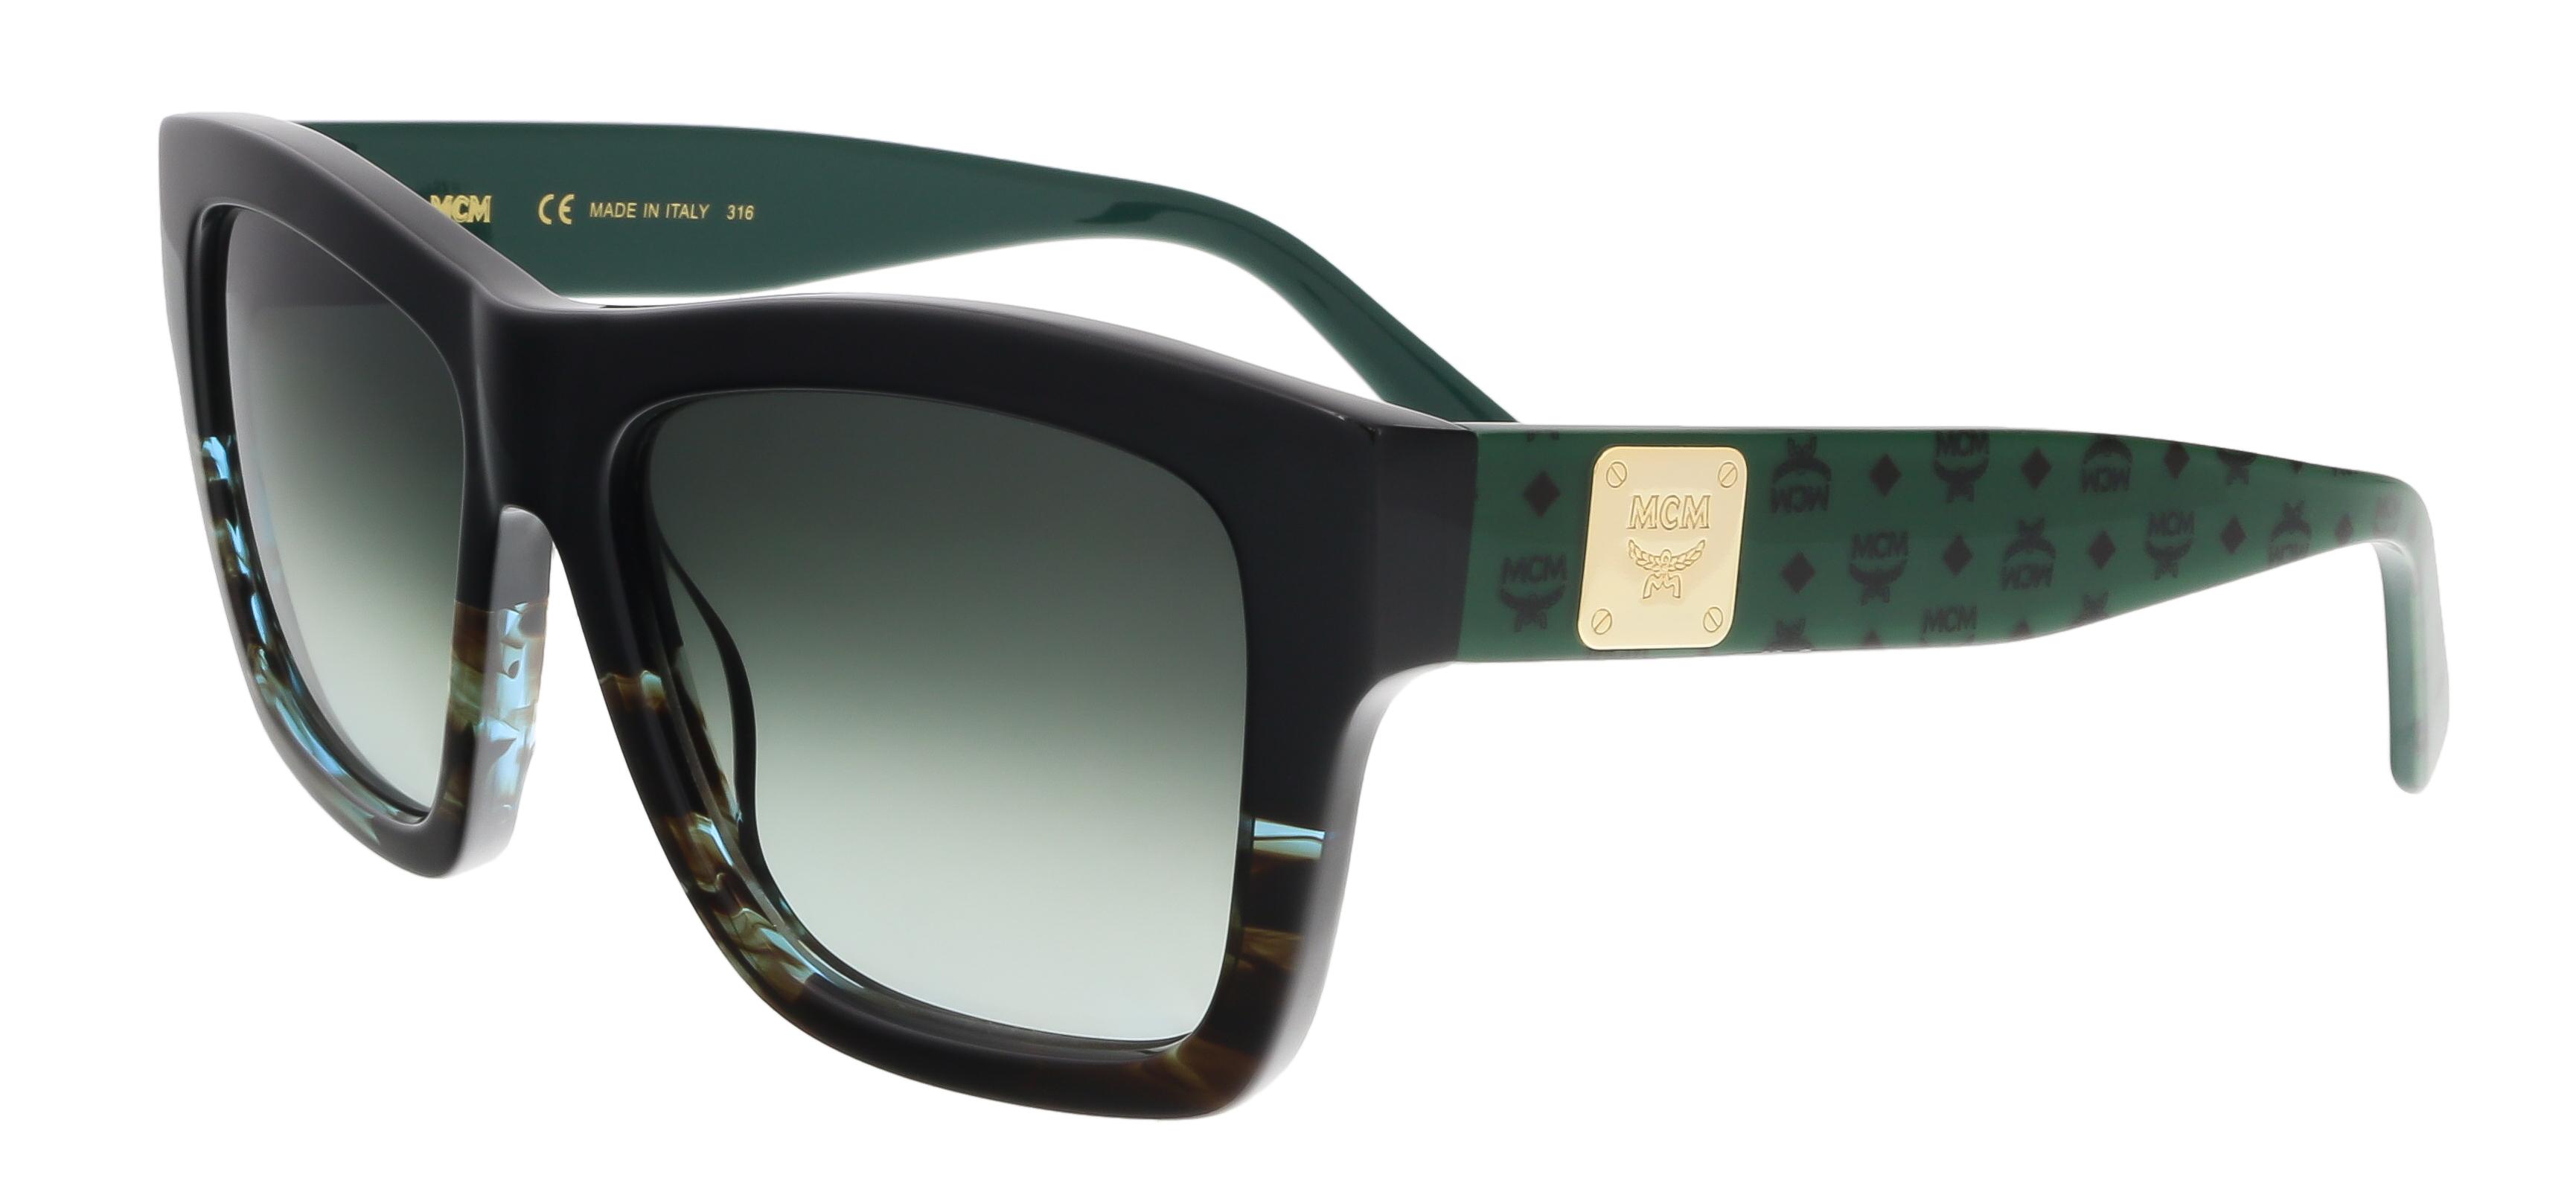 MCM607S 967 Black-Striped Aqua Square Feline Sunglasses